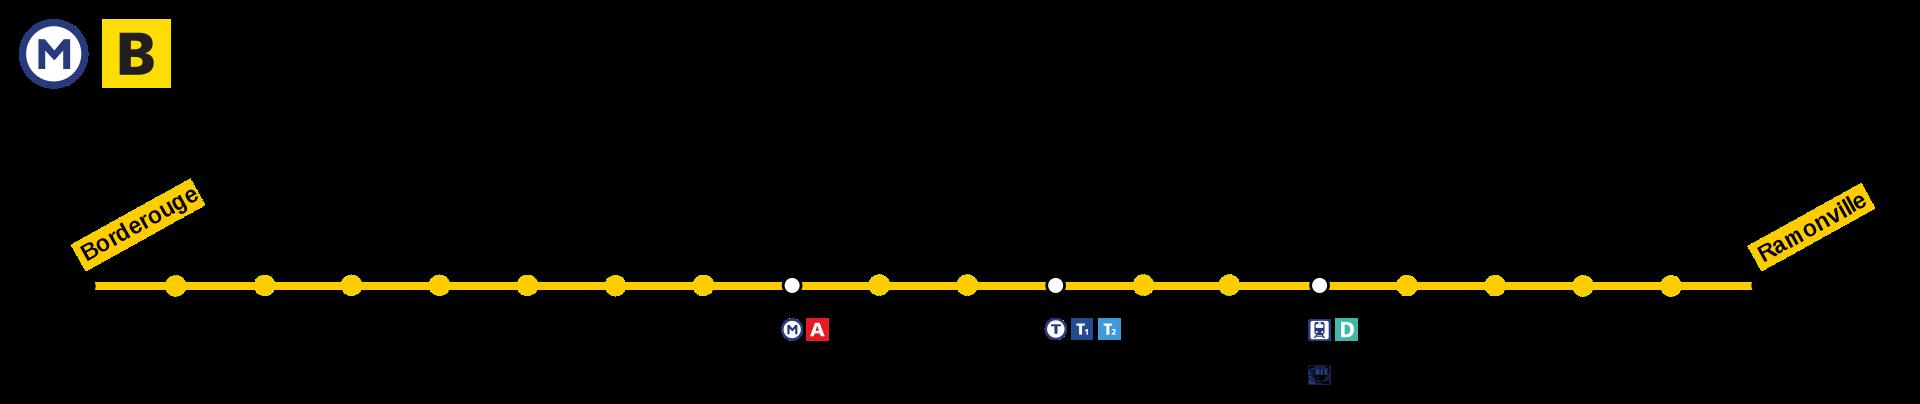 Plan Ligne B Métro Toulouse